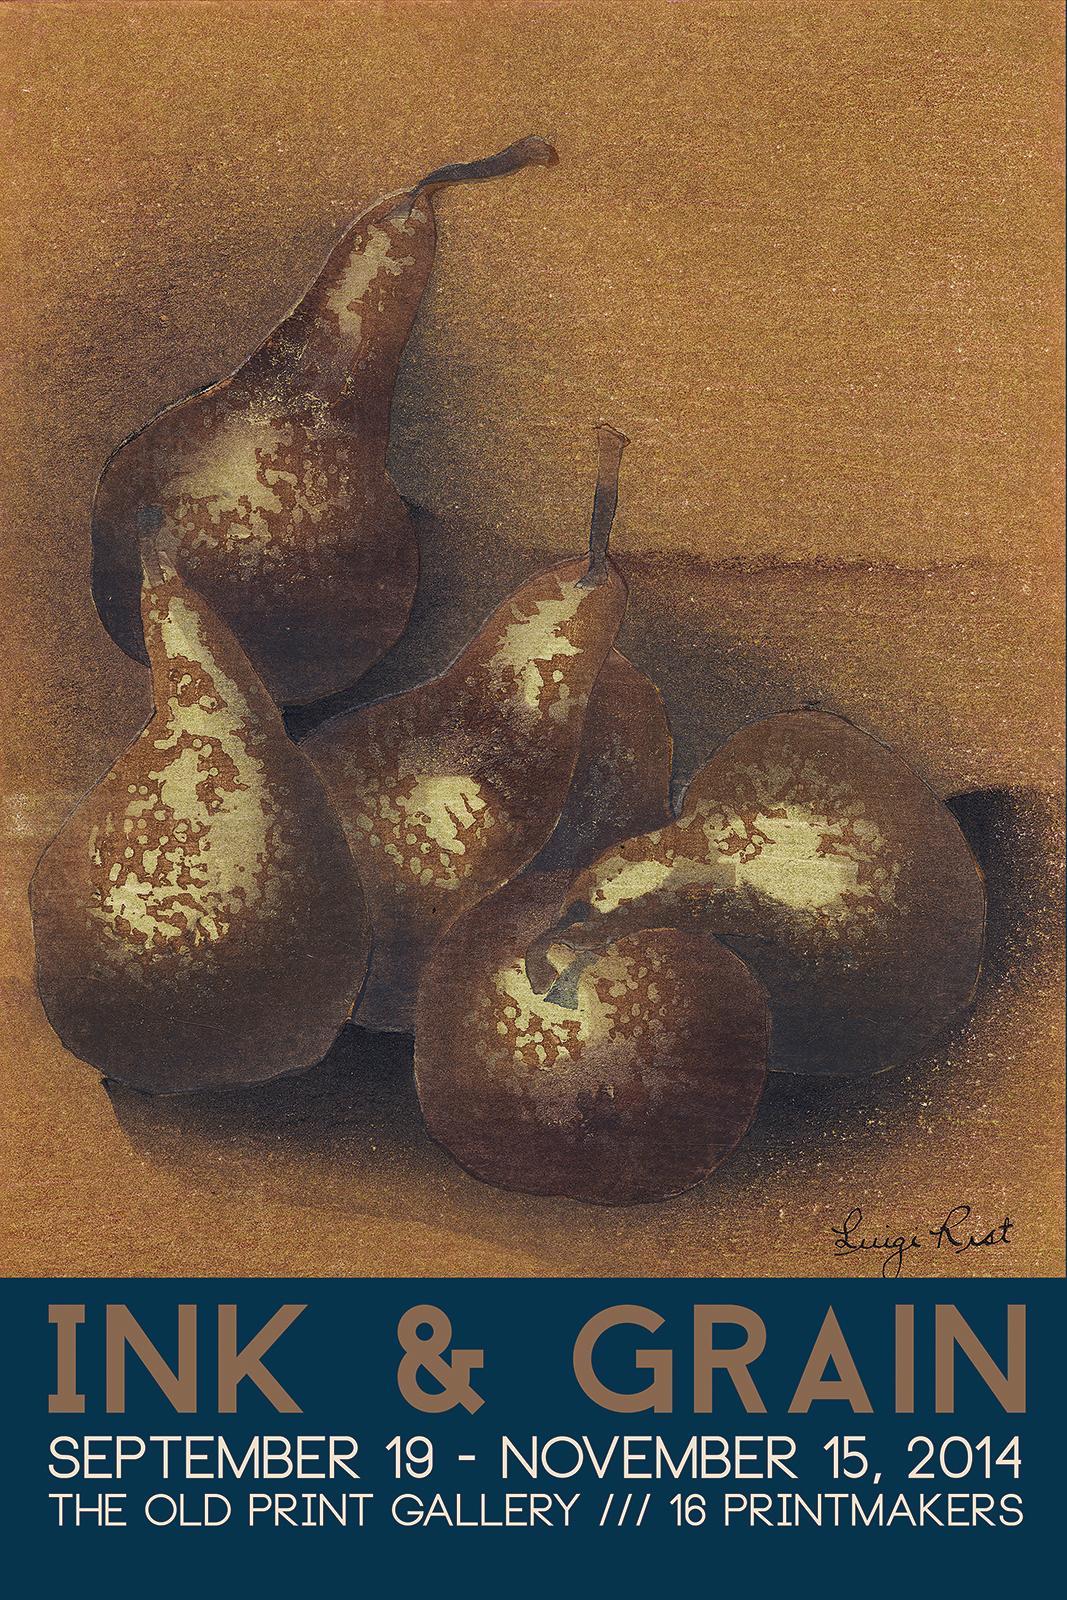 Ink & Grain small image rgb